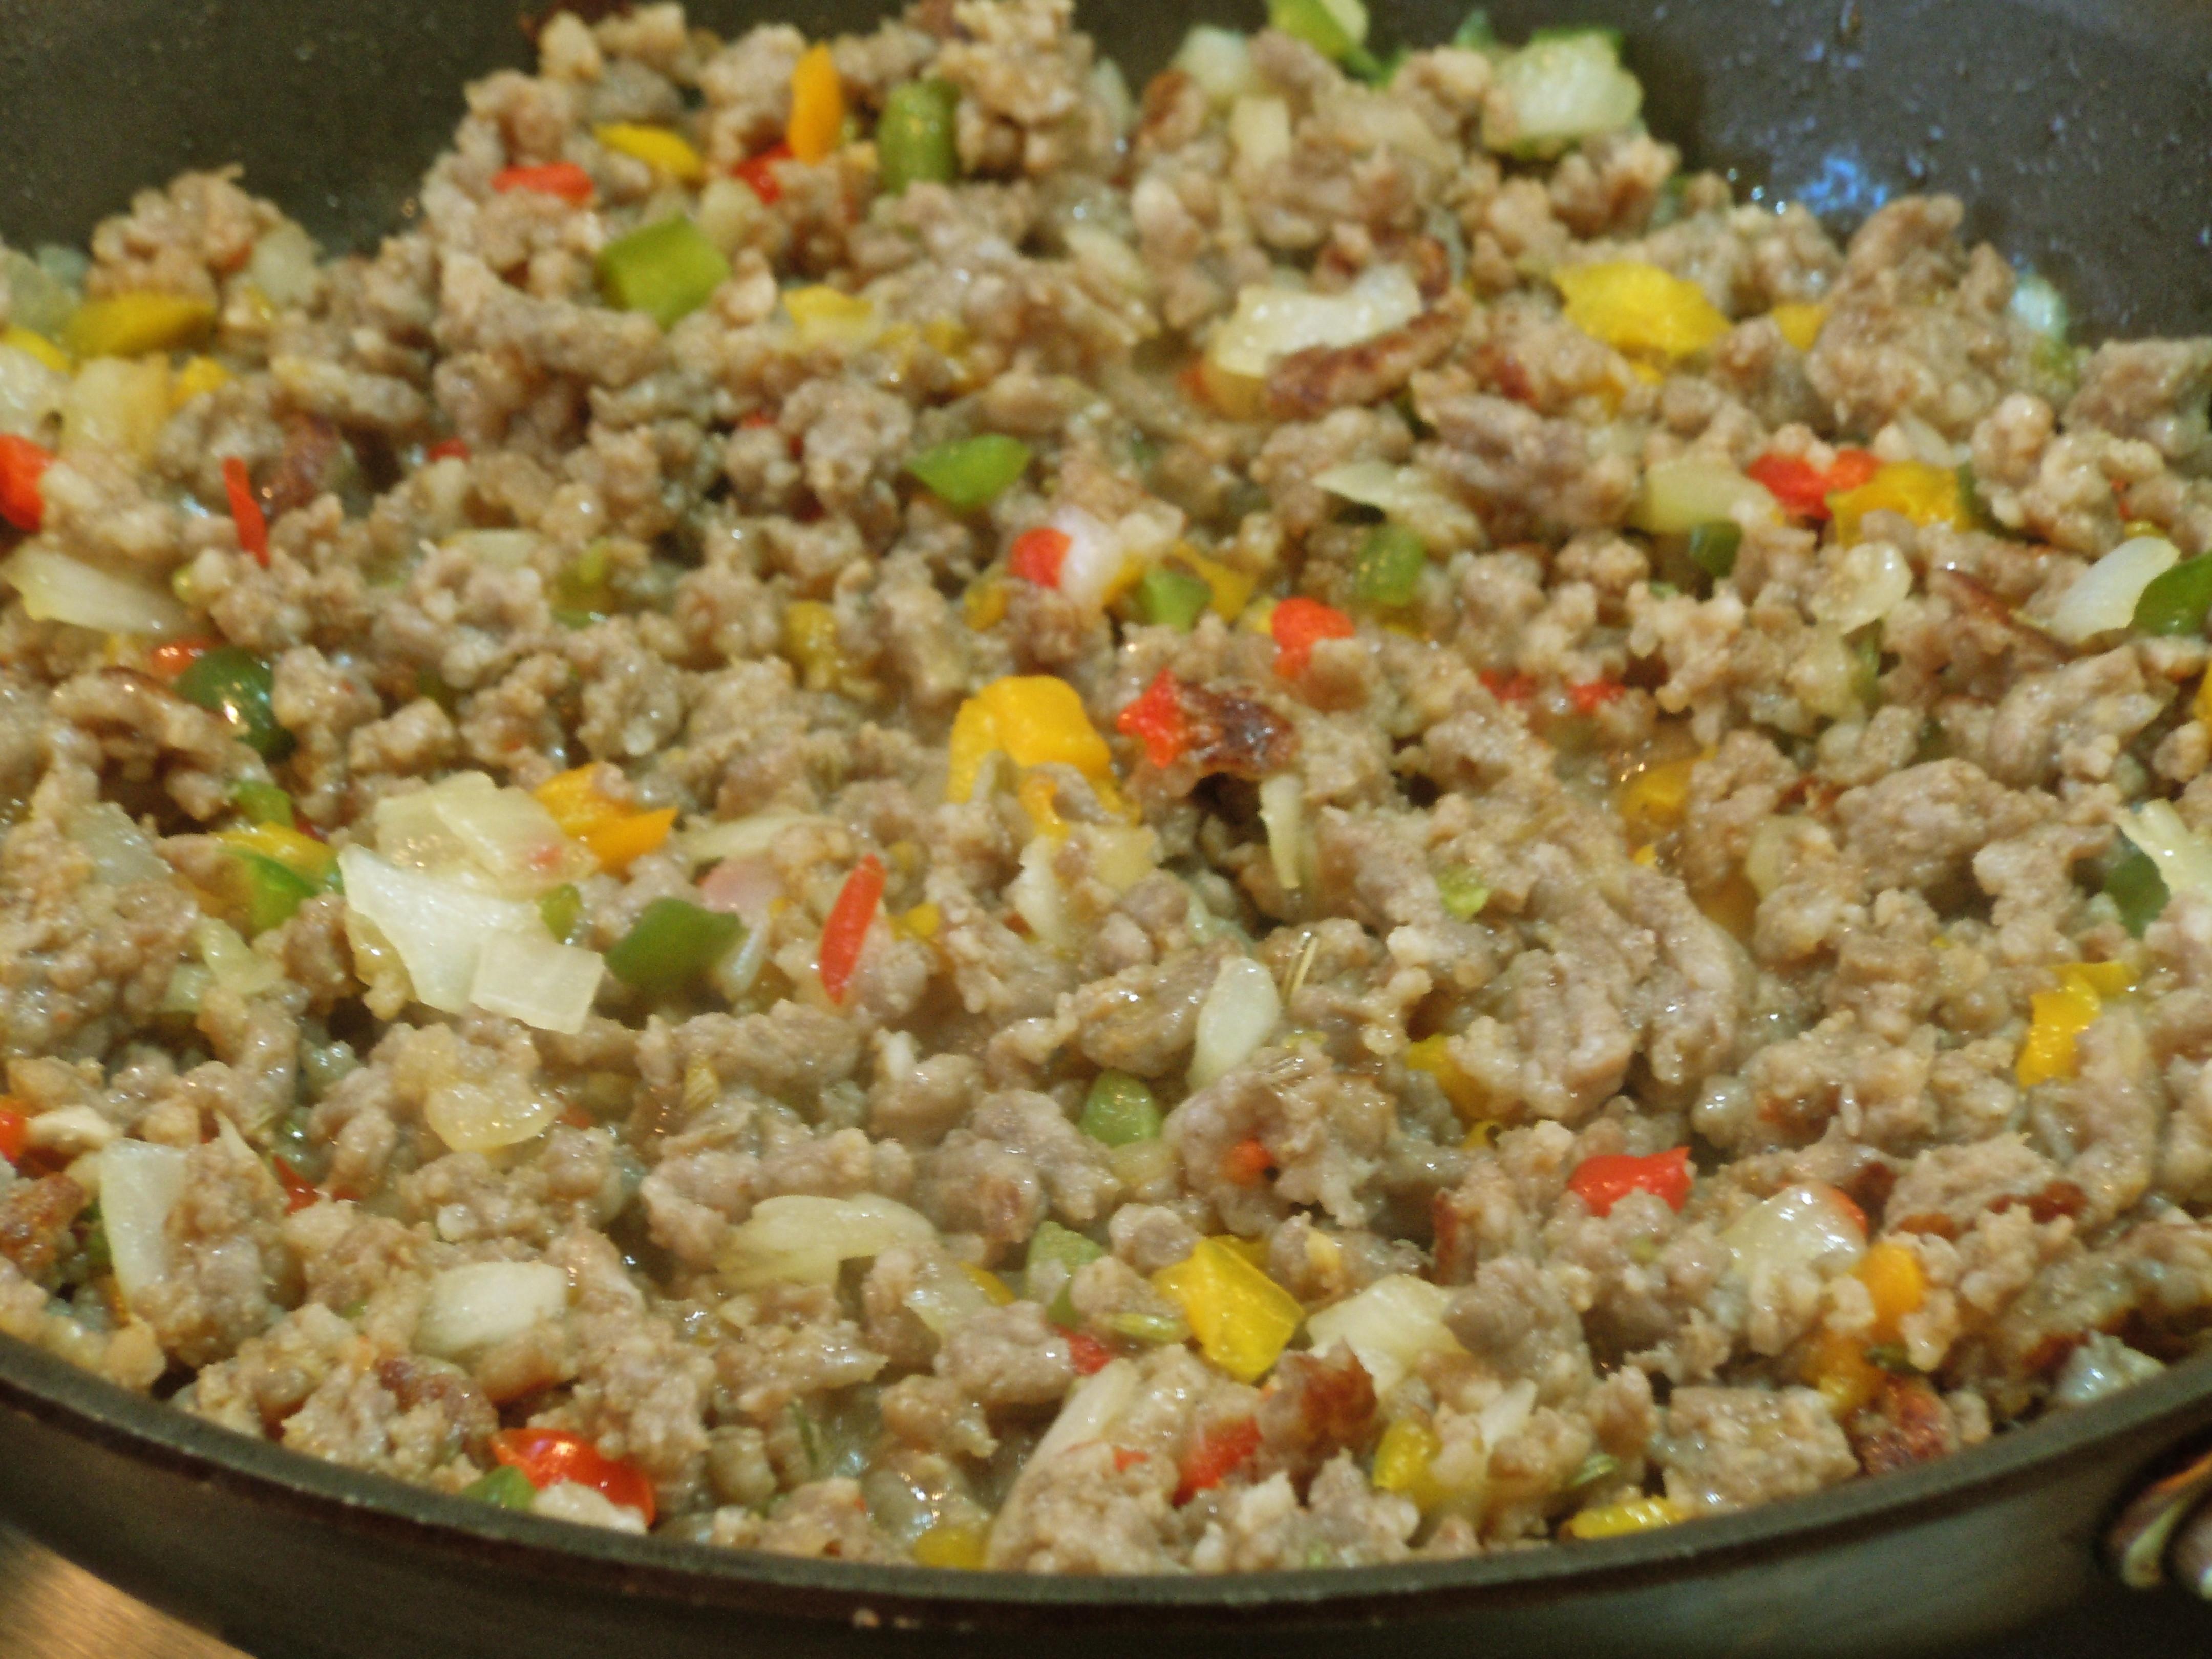 Ground Sausage Dinner Recipes  pork sausage recipes dinner